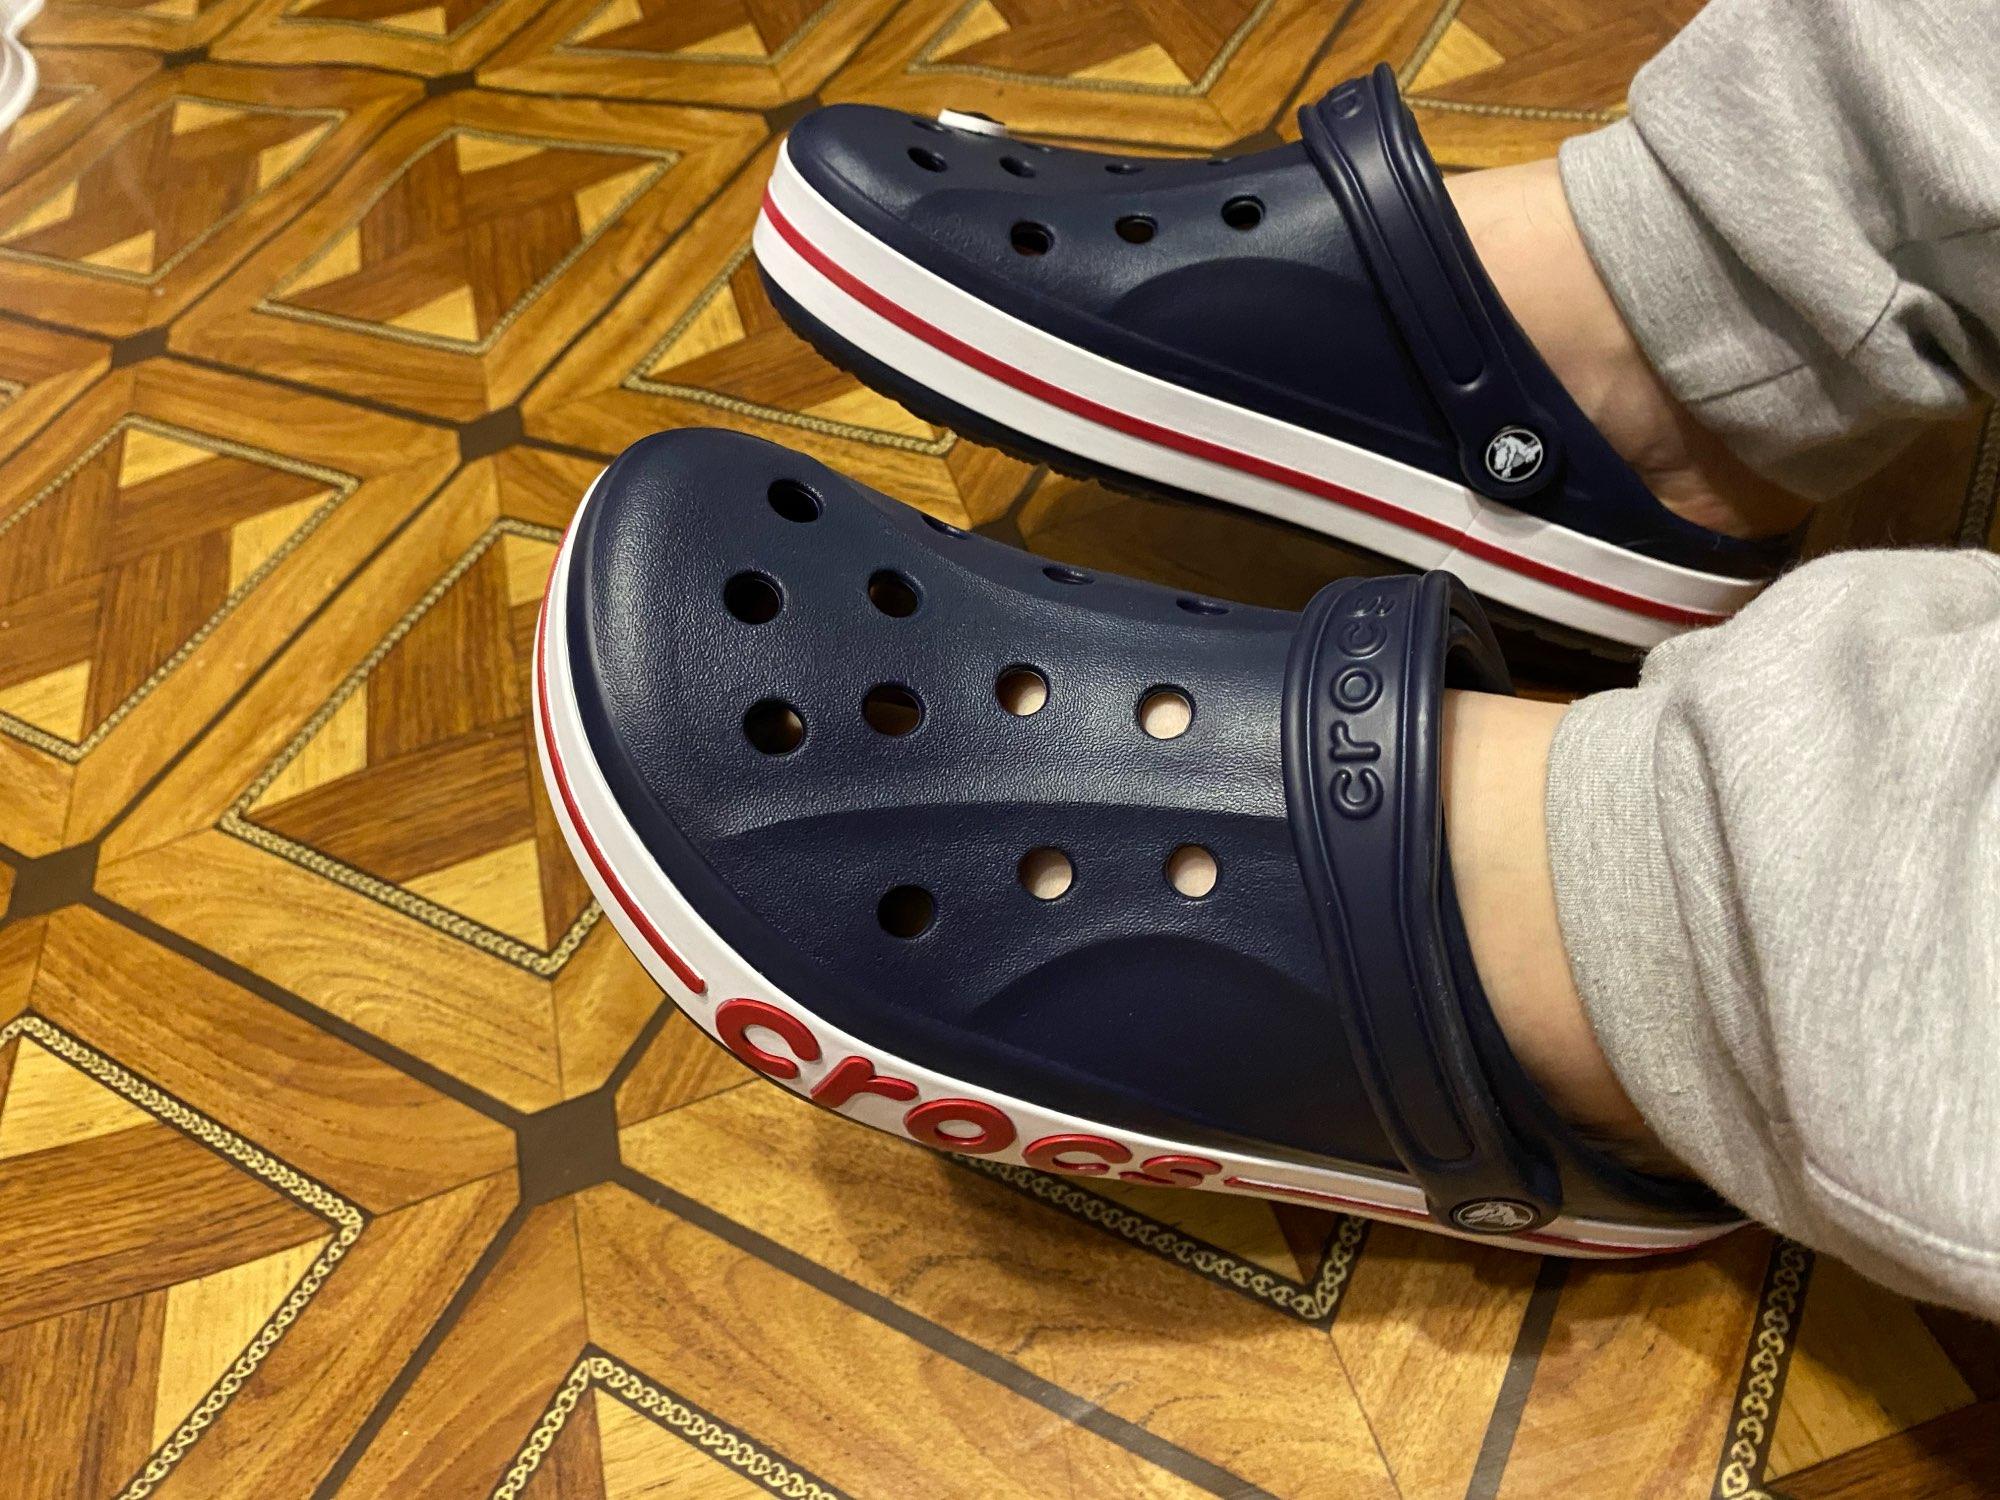 CROCS Bayaband Clog UNISEX for male, for female, men's clogs, women's clogs TmallFS shoes rubber slippers|Beach & Outdoor Sandals|   - AliExpress